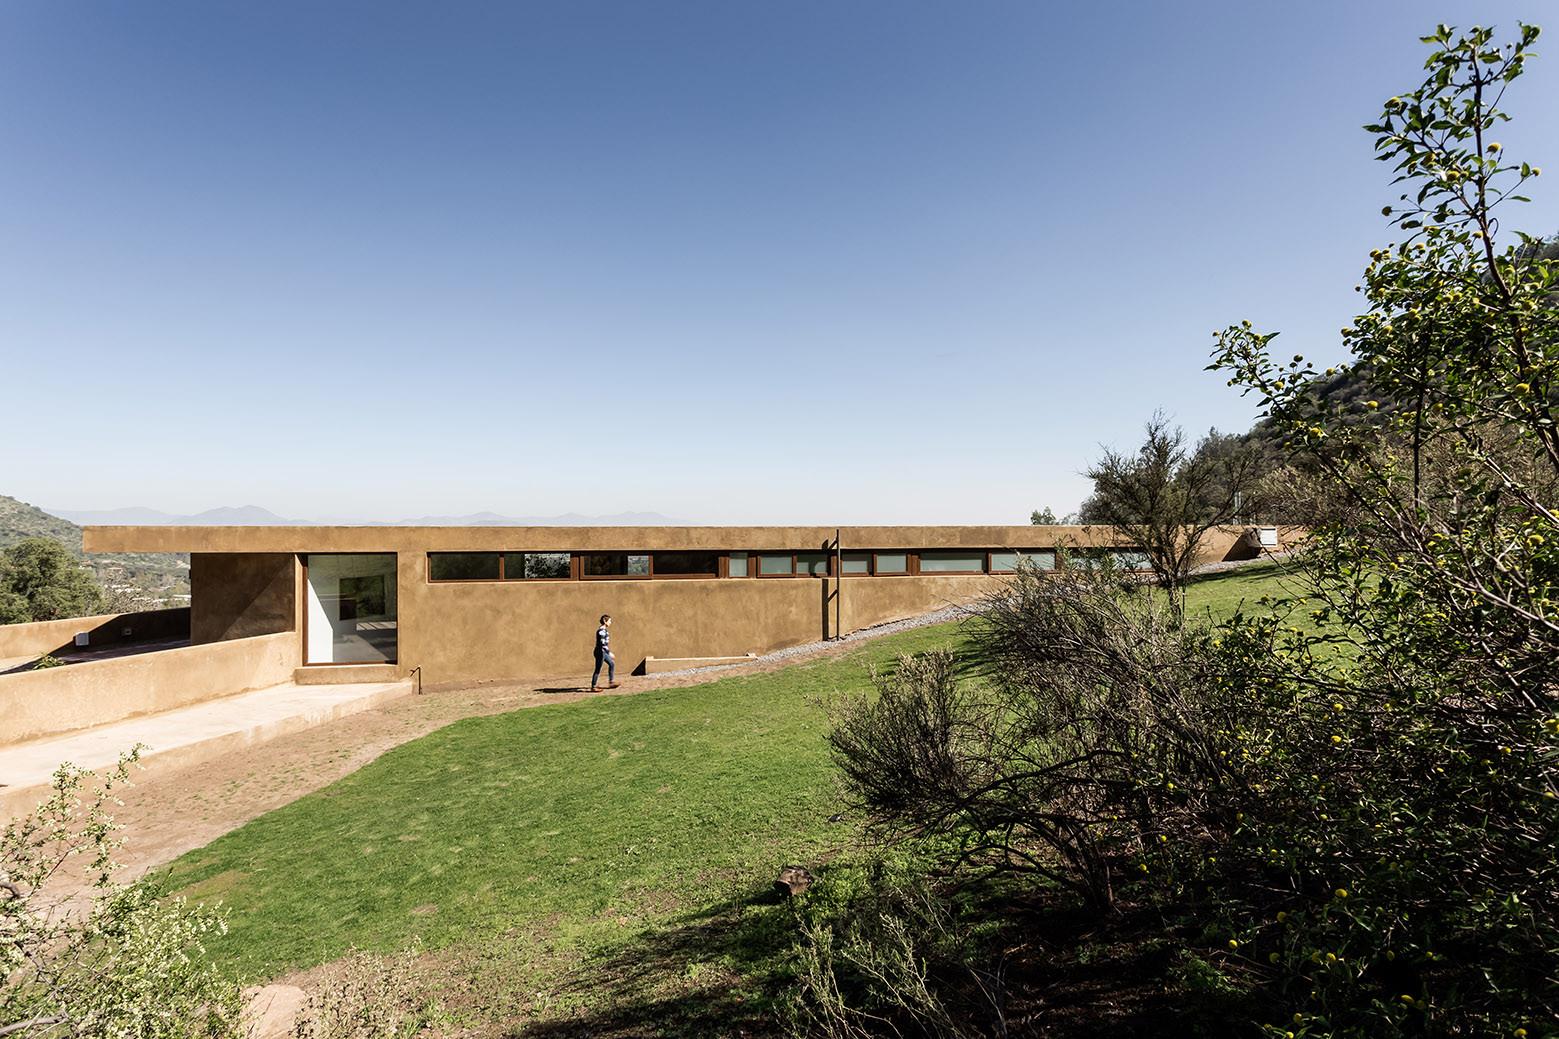 Los Morros House / Chauriye Stäger Arquitectos , © Midas / Pablo Blanco